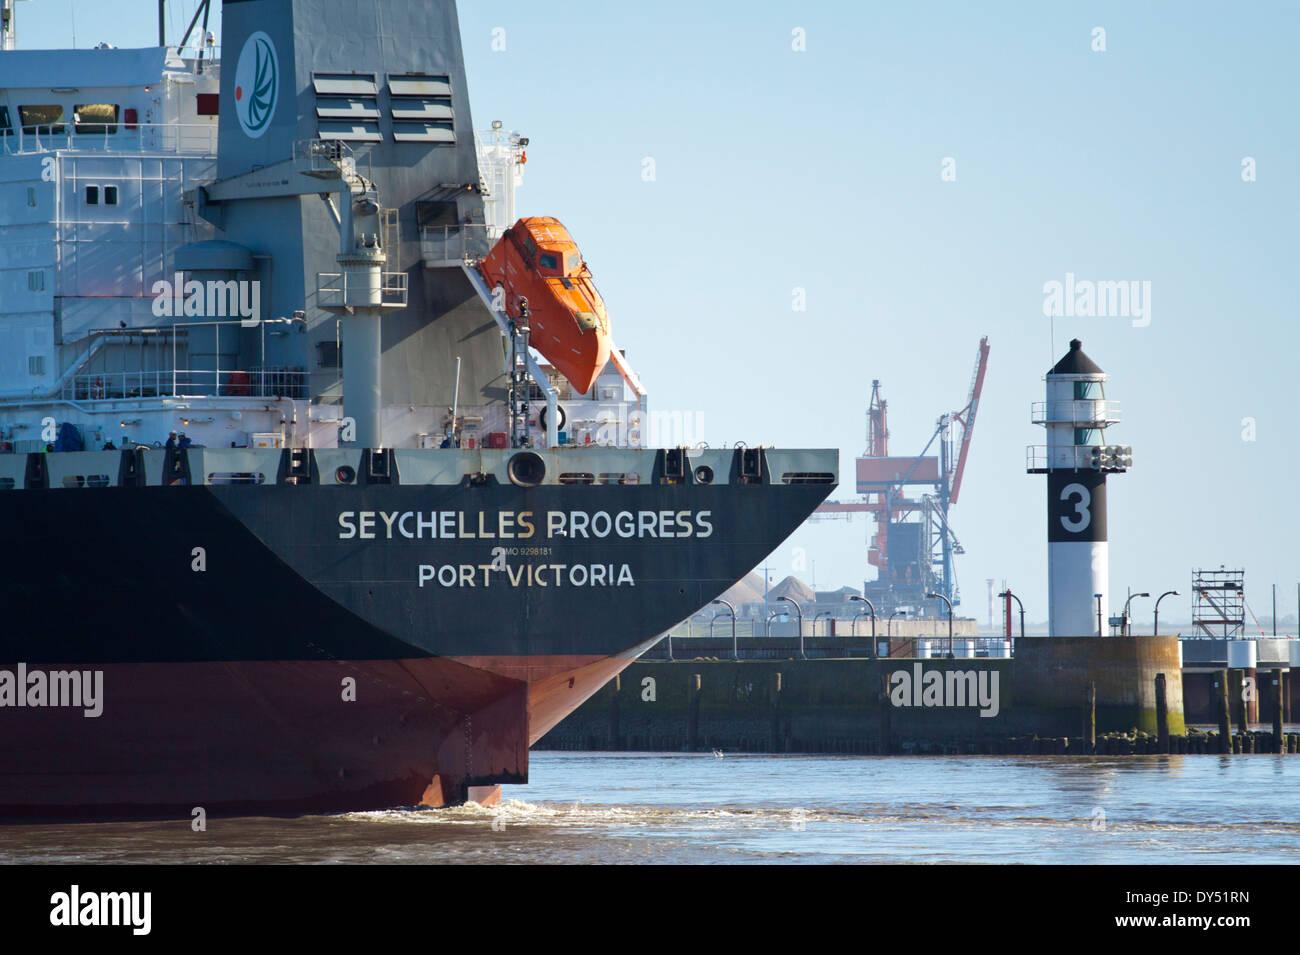 Chemical tanker Seychelles Progress as she enters the Brunsbuettel lock of the Kiel Canal - Stock Image